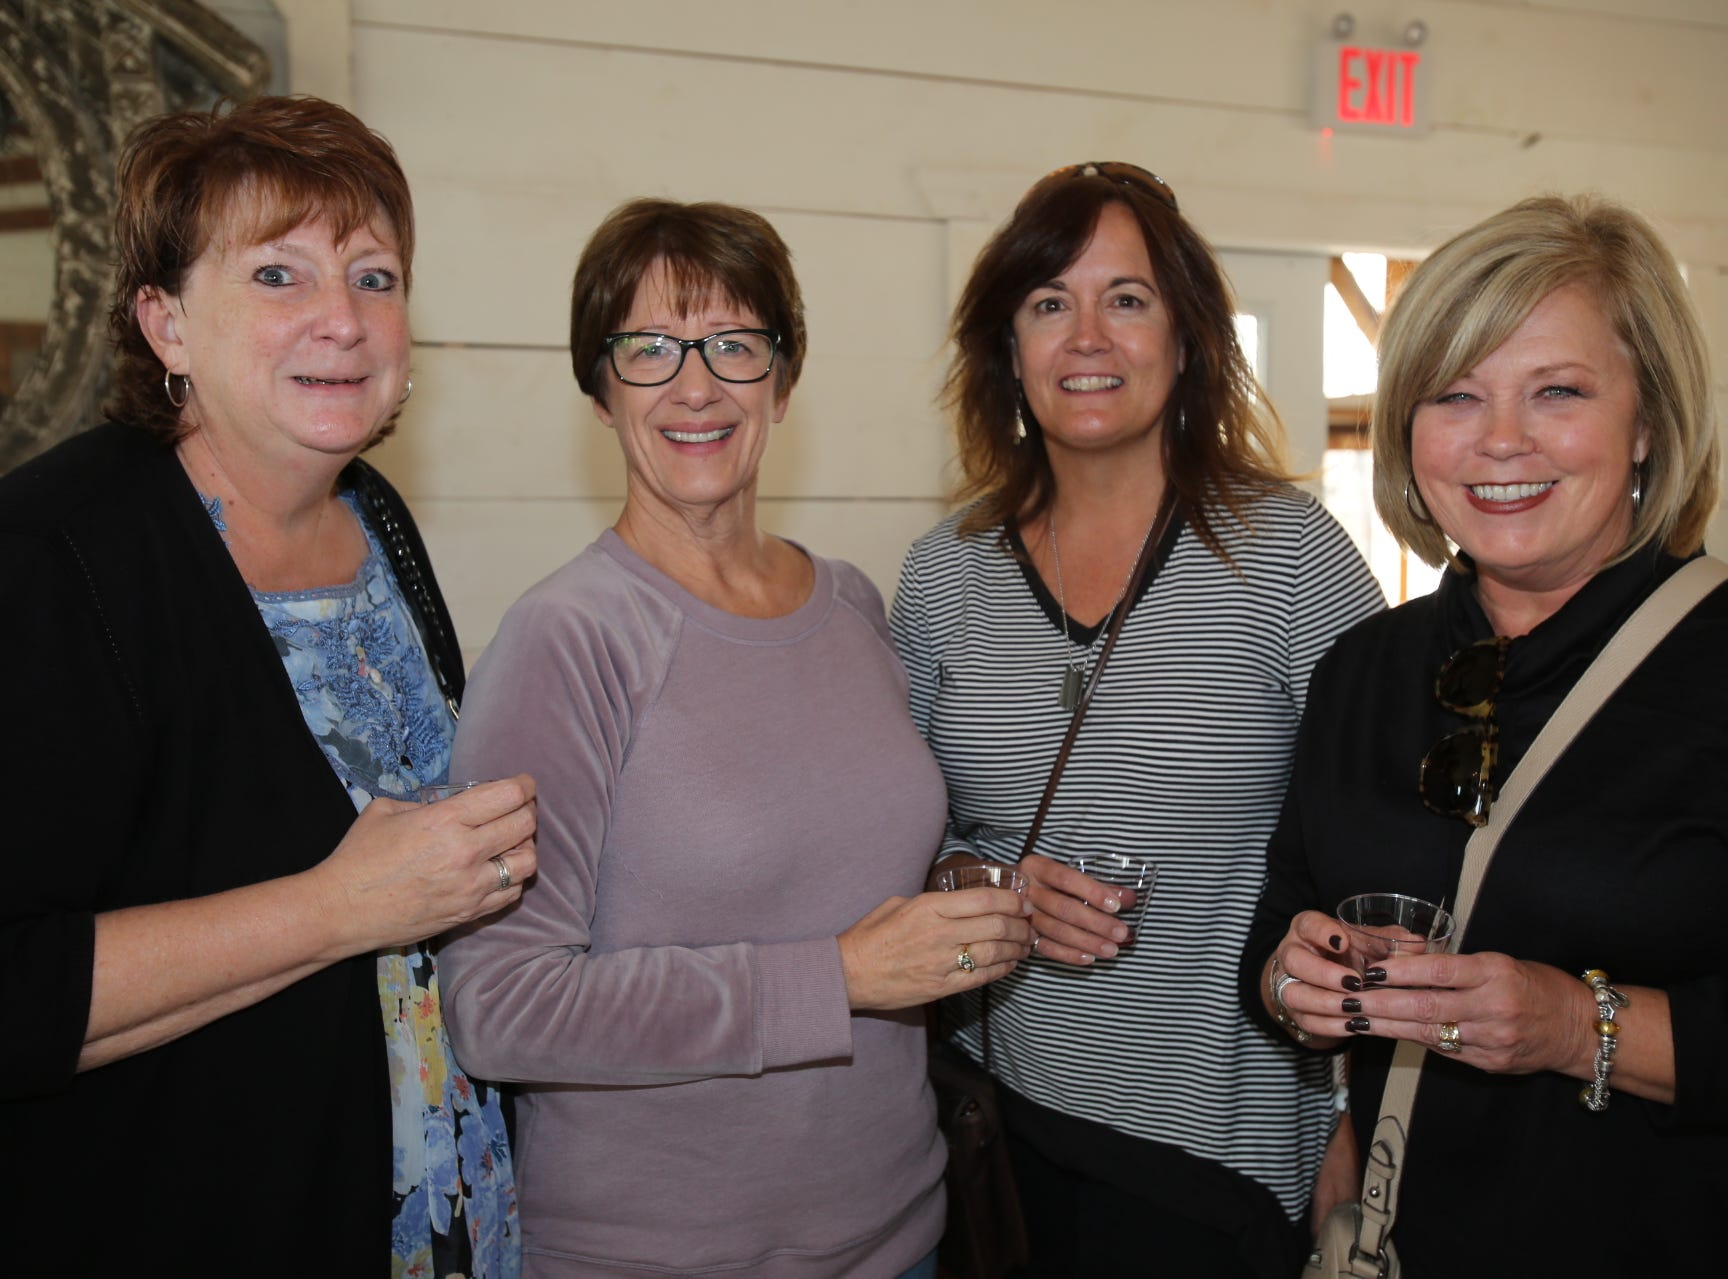 Debbie Duncan, Candy Newbury, Elaine Kubik, and Debbie Nelson